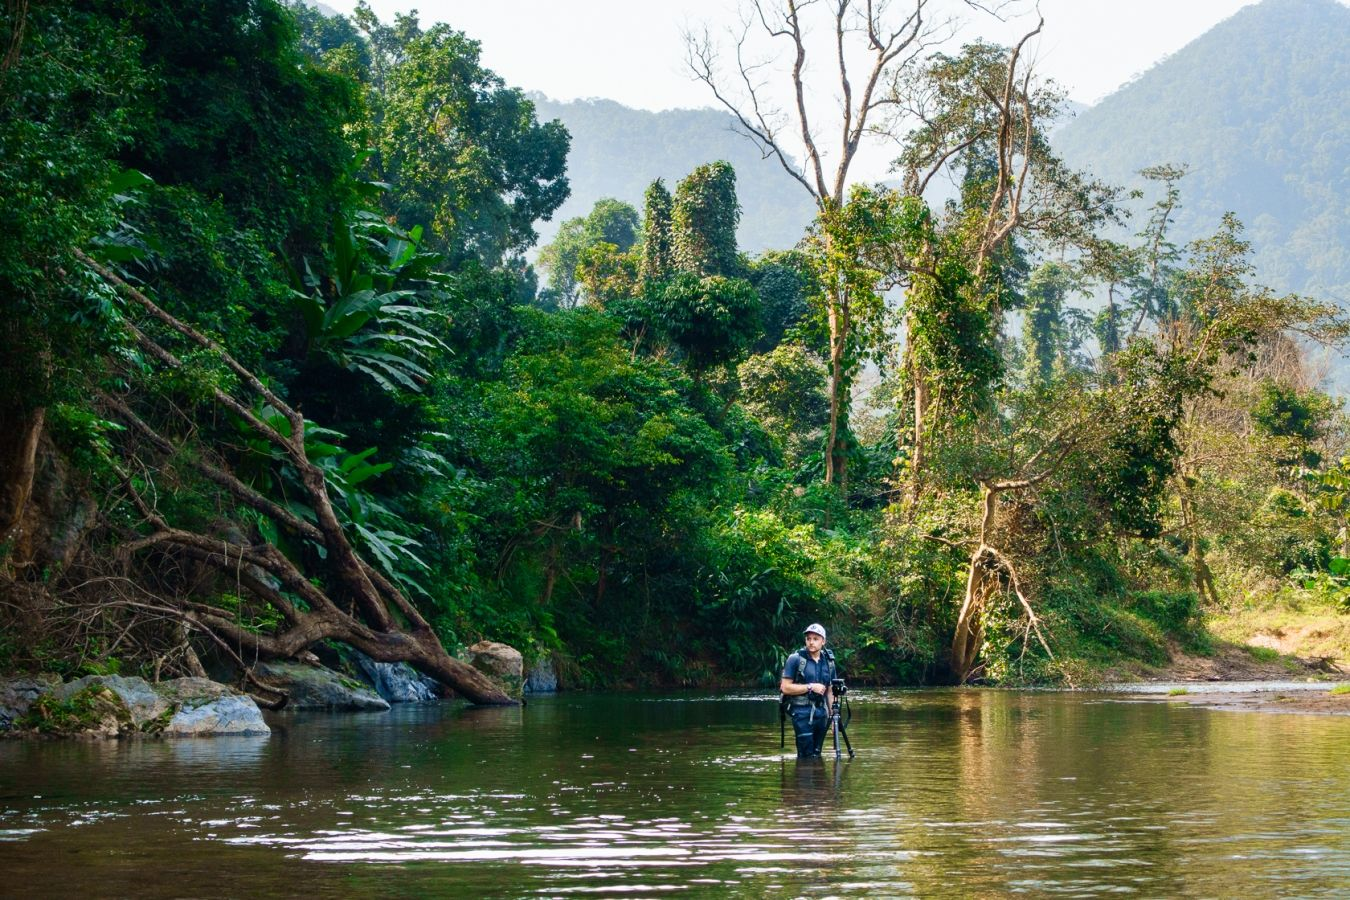 Martin Edström capturing a 360-image in a river